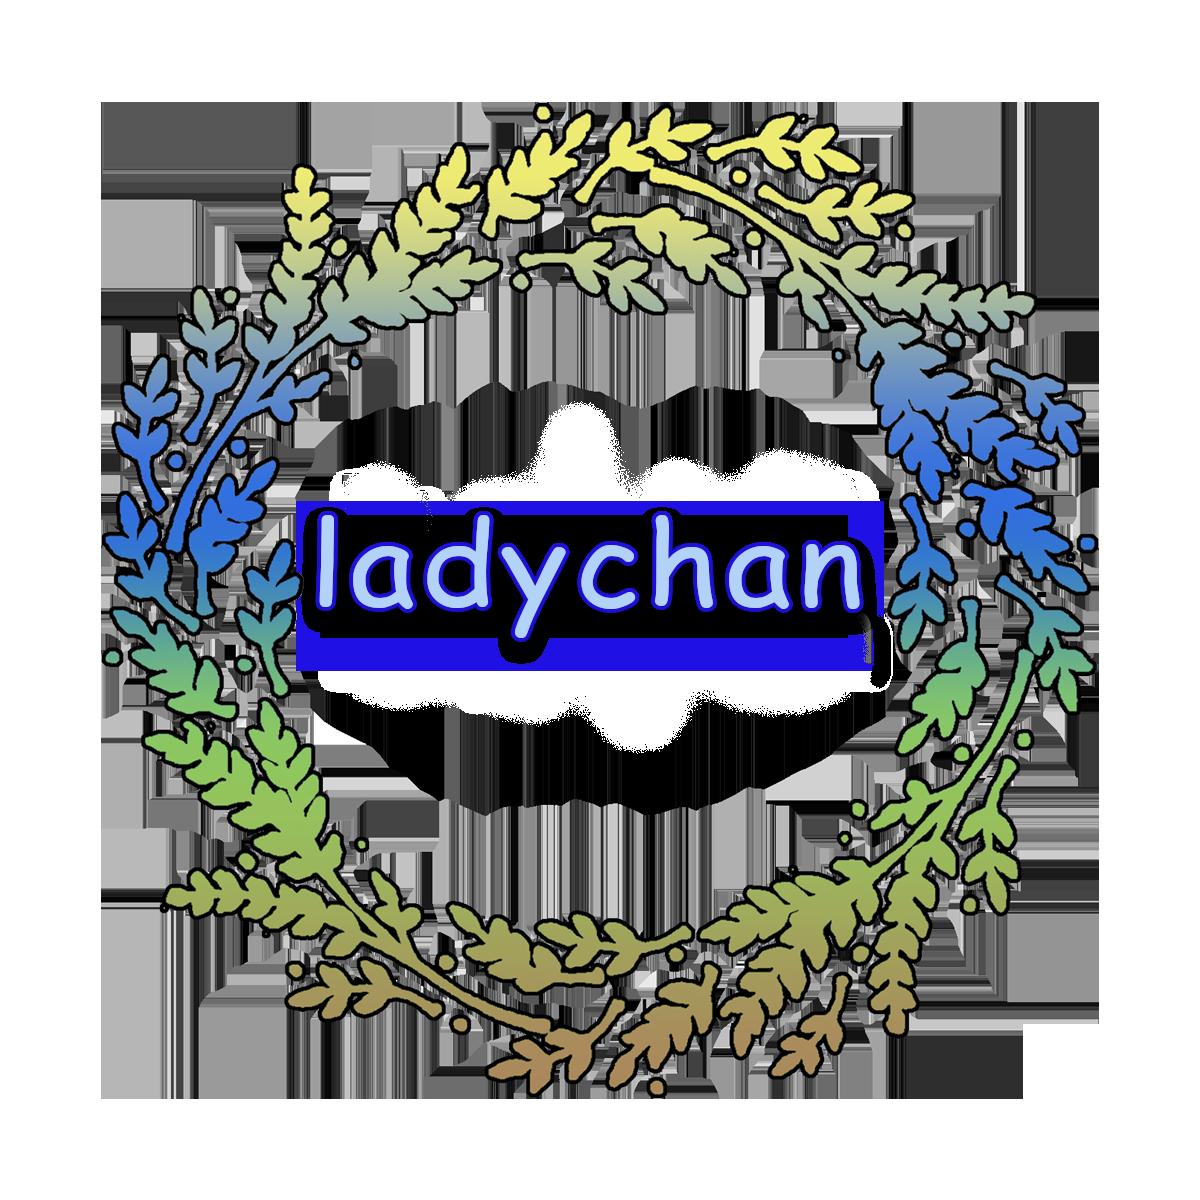 ladychan